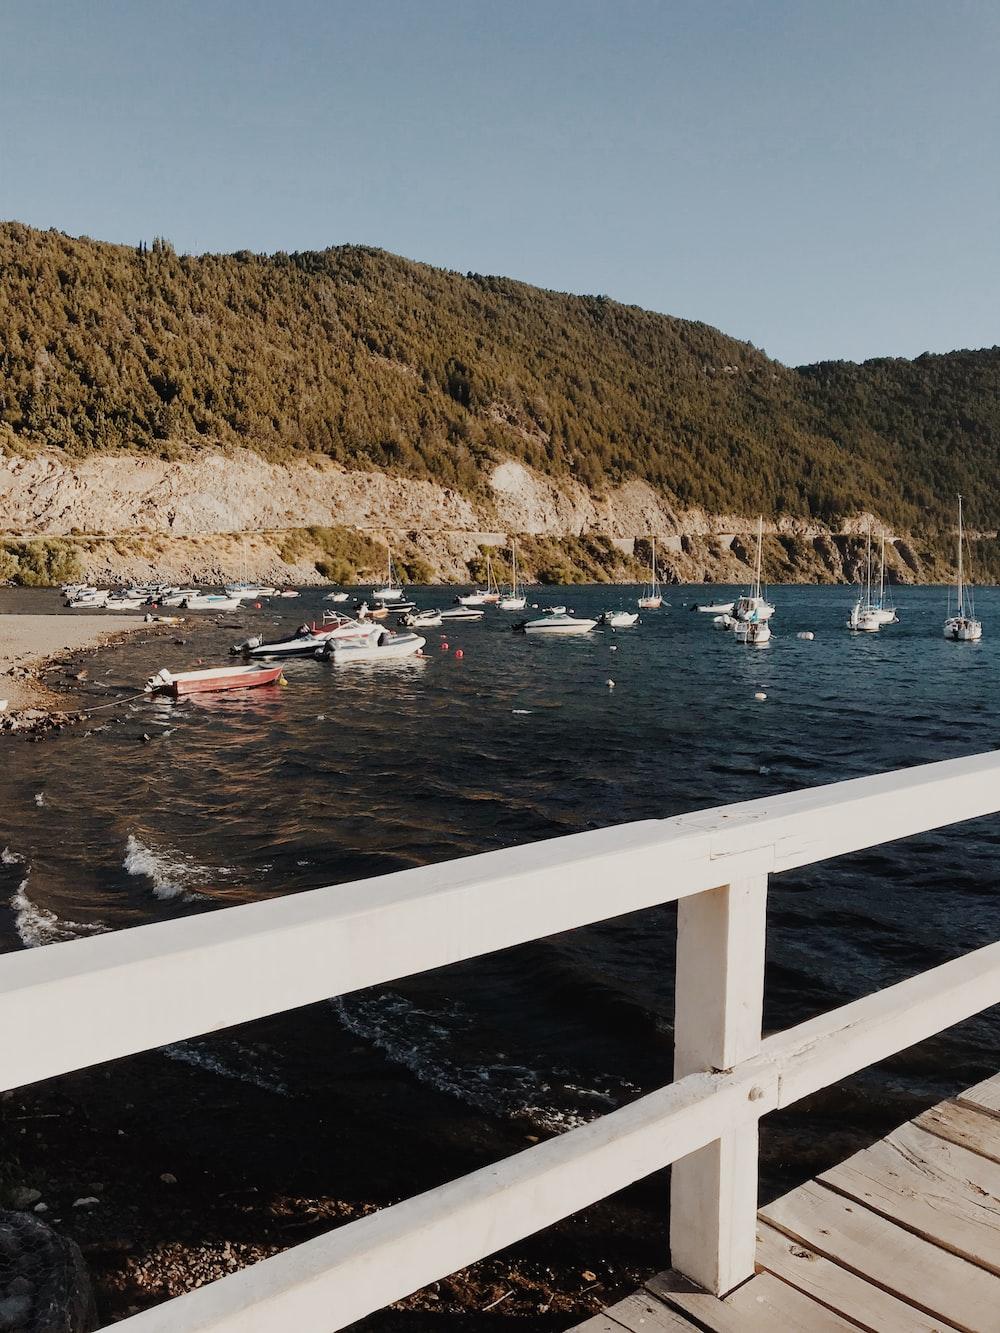 motorboats on body of water near white wooden docks